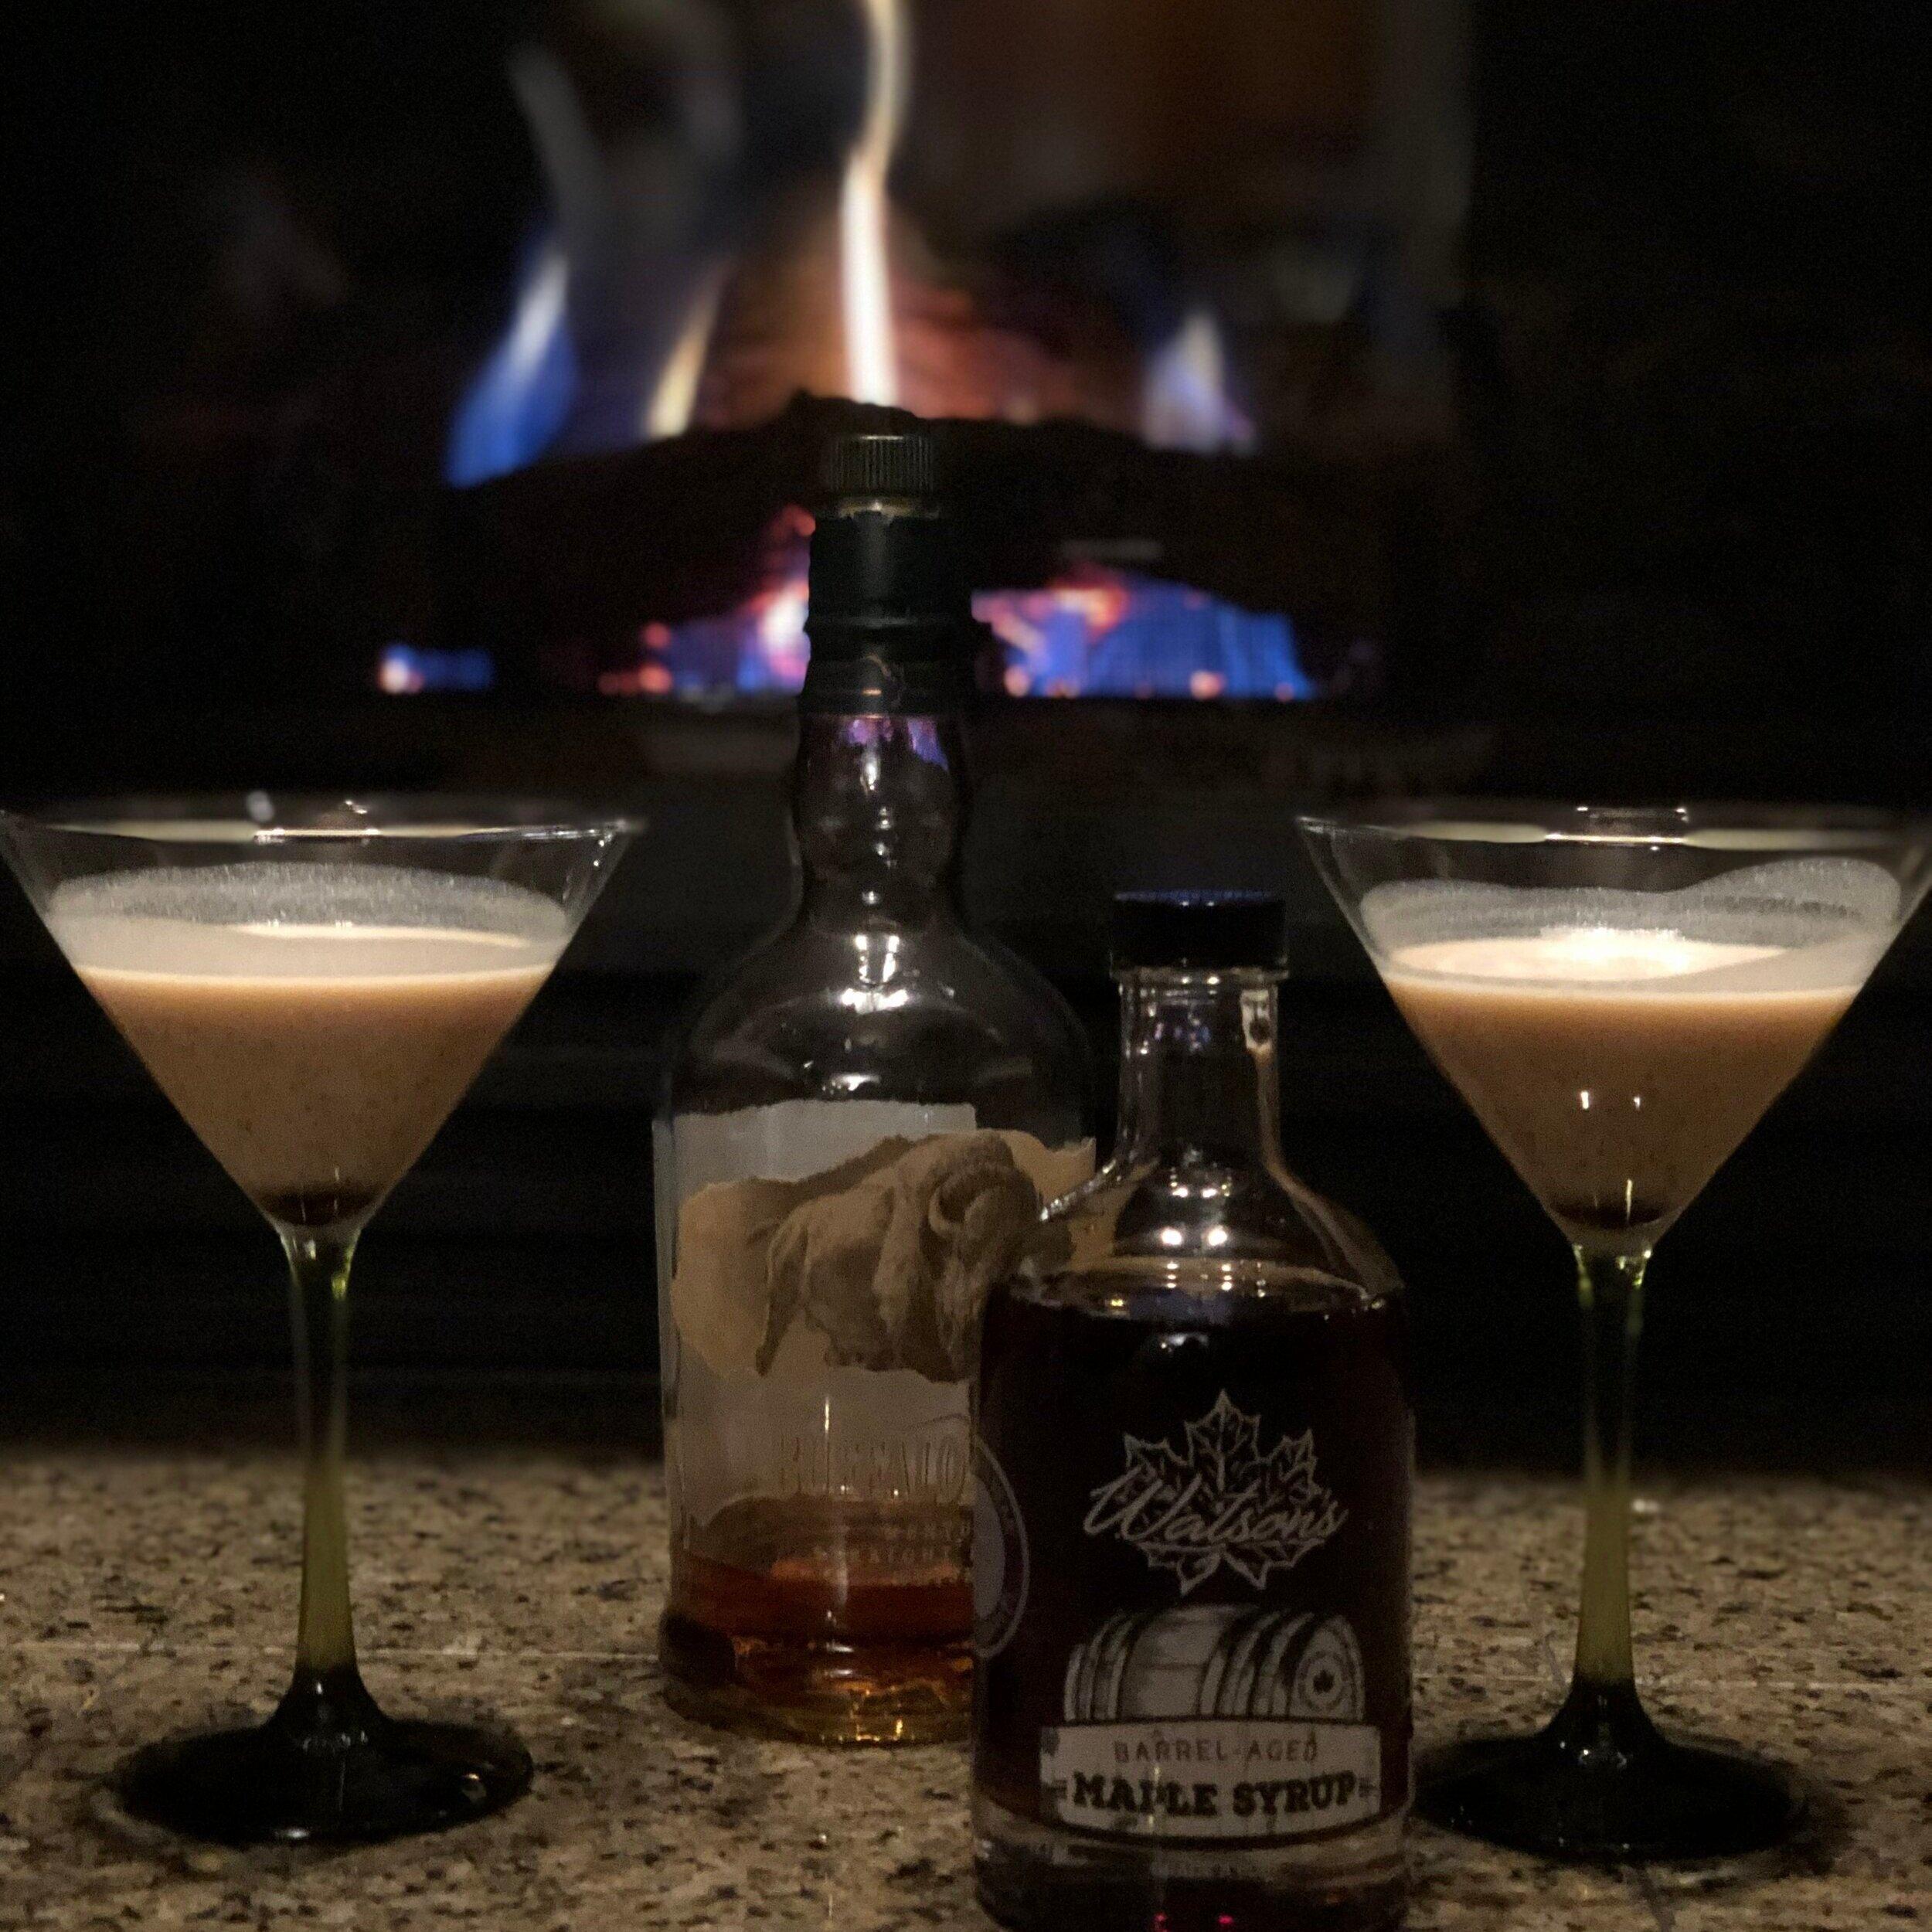 {Flamin' Barrel} - - 3 martinis- 5oz Buffalo Trace- 3 Luchardo Cherries with scoop of juice- 1.5oz Watson's Syrup- 1oz creamDash of Cinnamon, Clove, Cayenne and Nutmeg